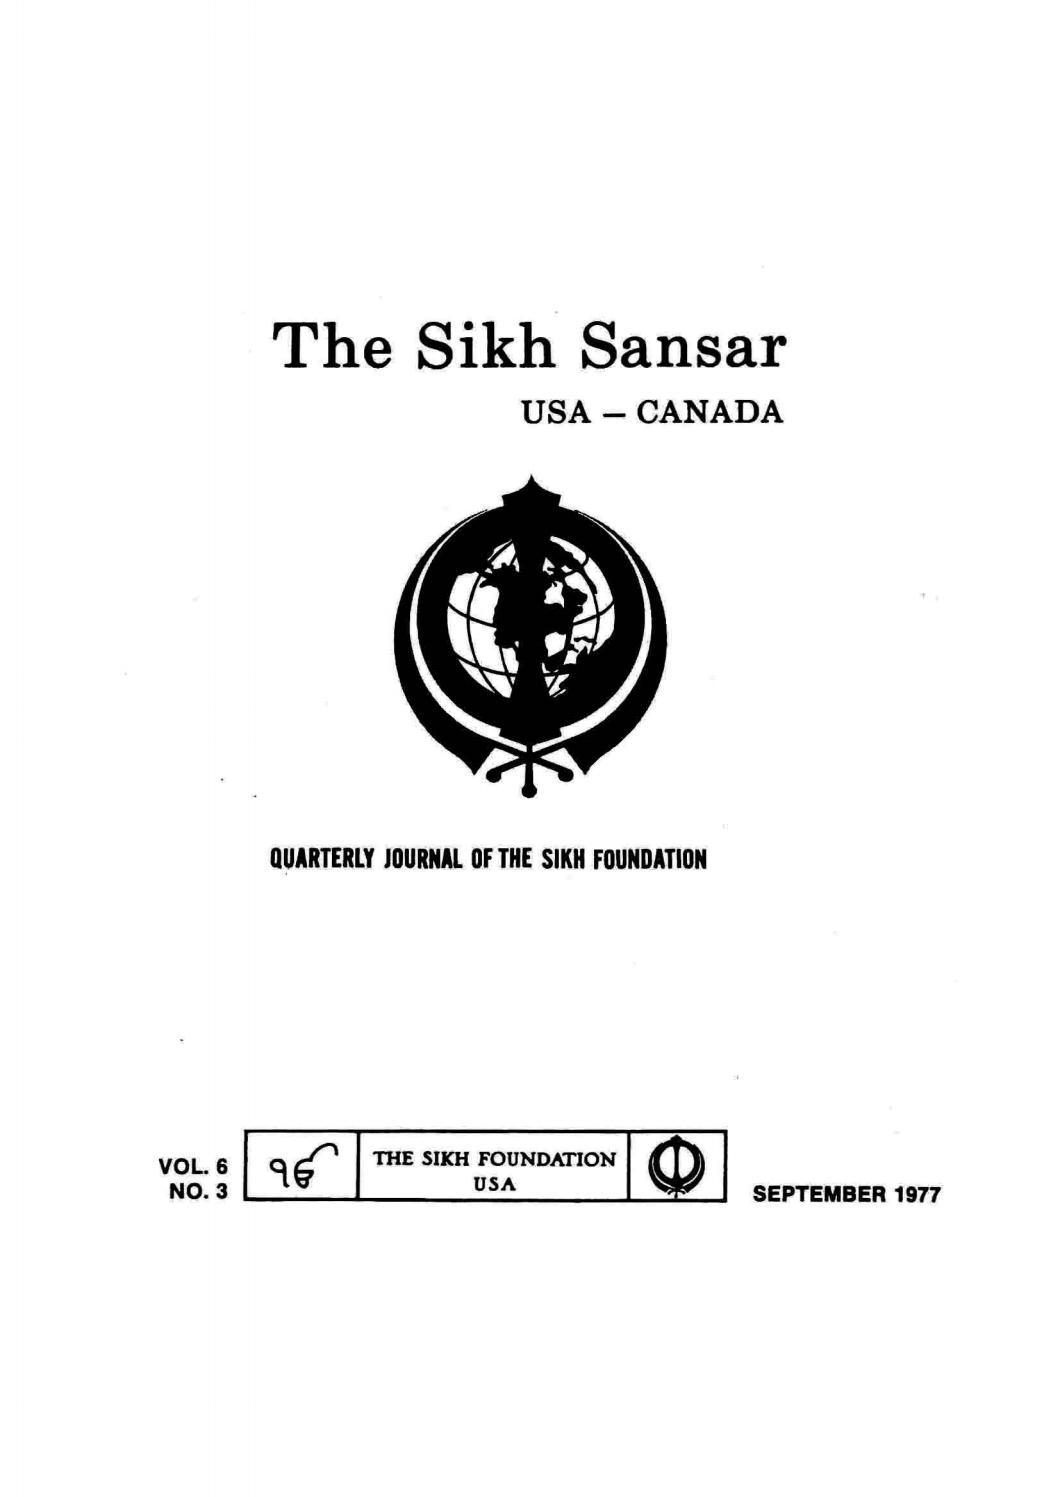 The Sikh Sansar USA-Canada Vol  6 No  3 September 1977 by